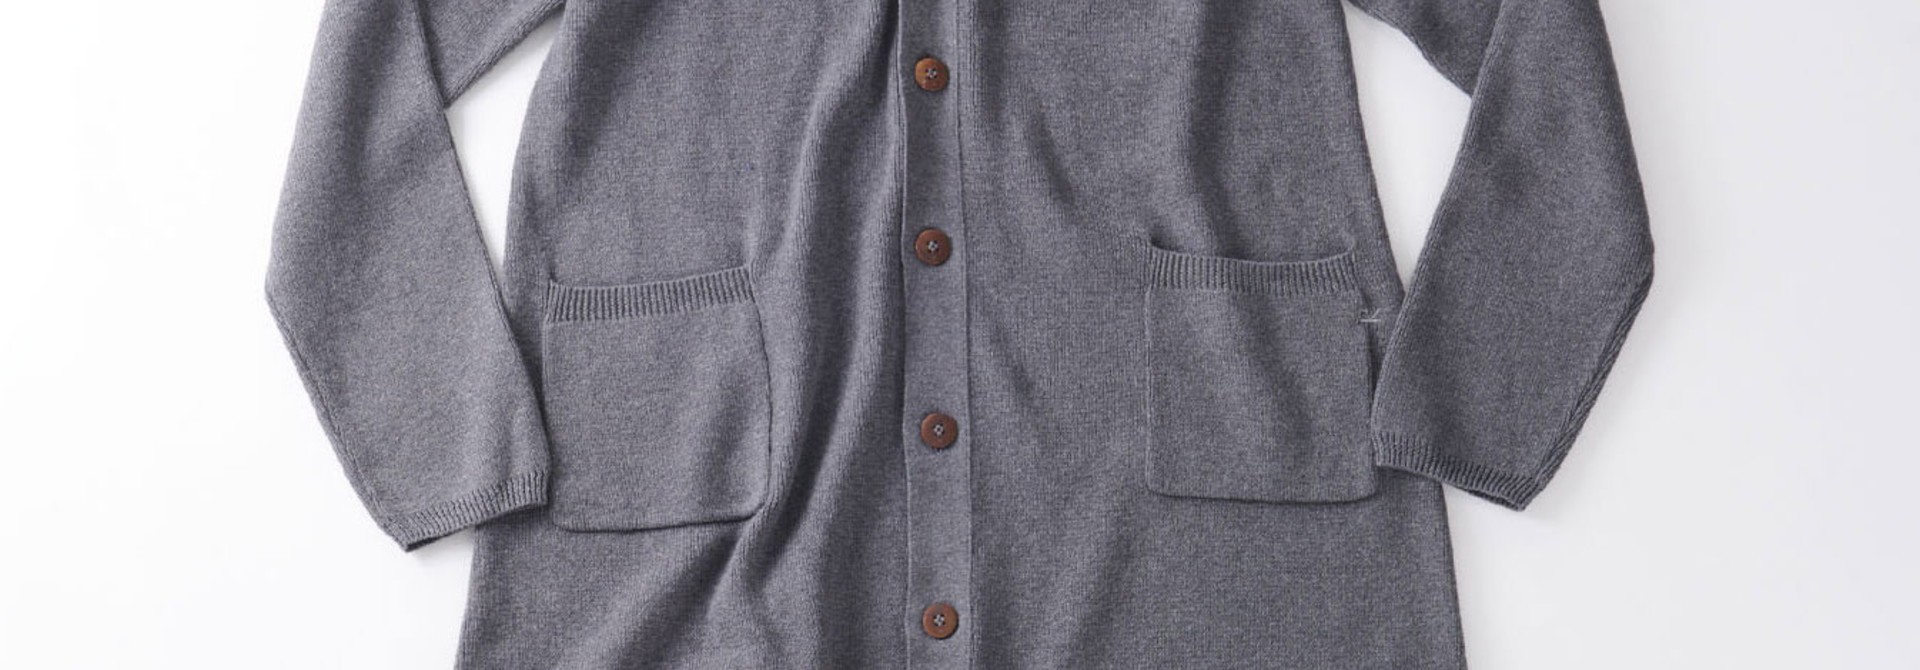 WH Supima Knit-sew Coat